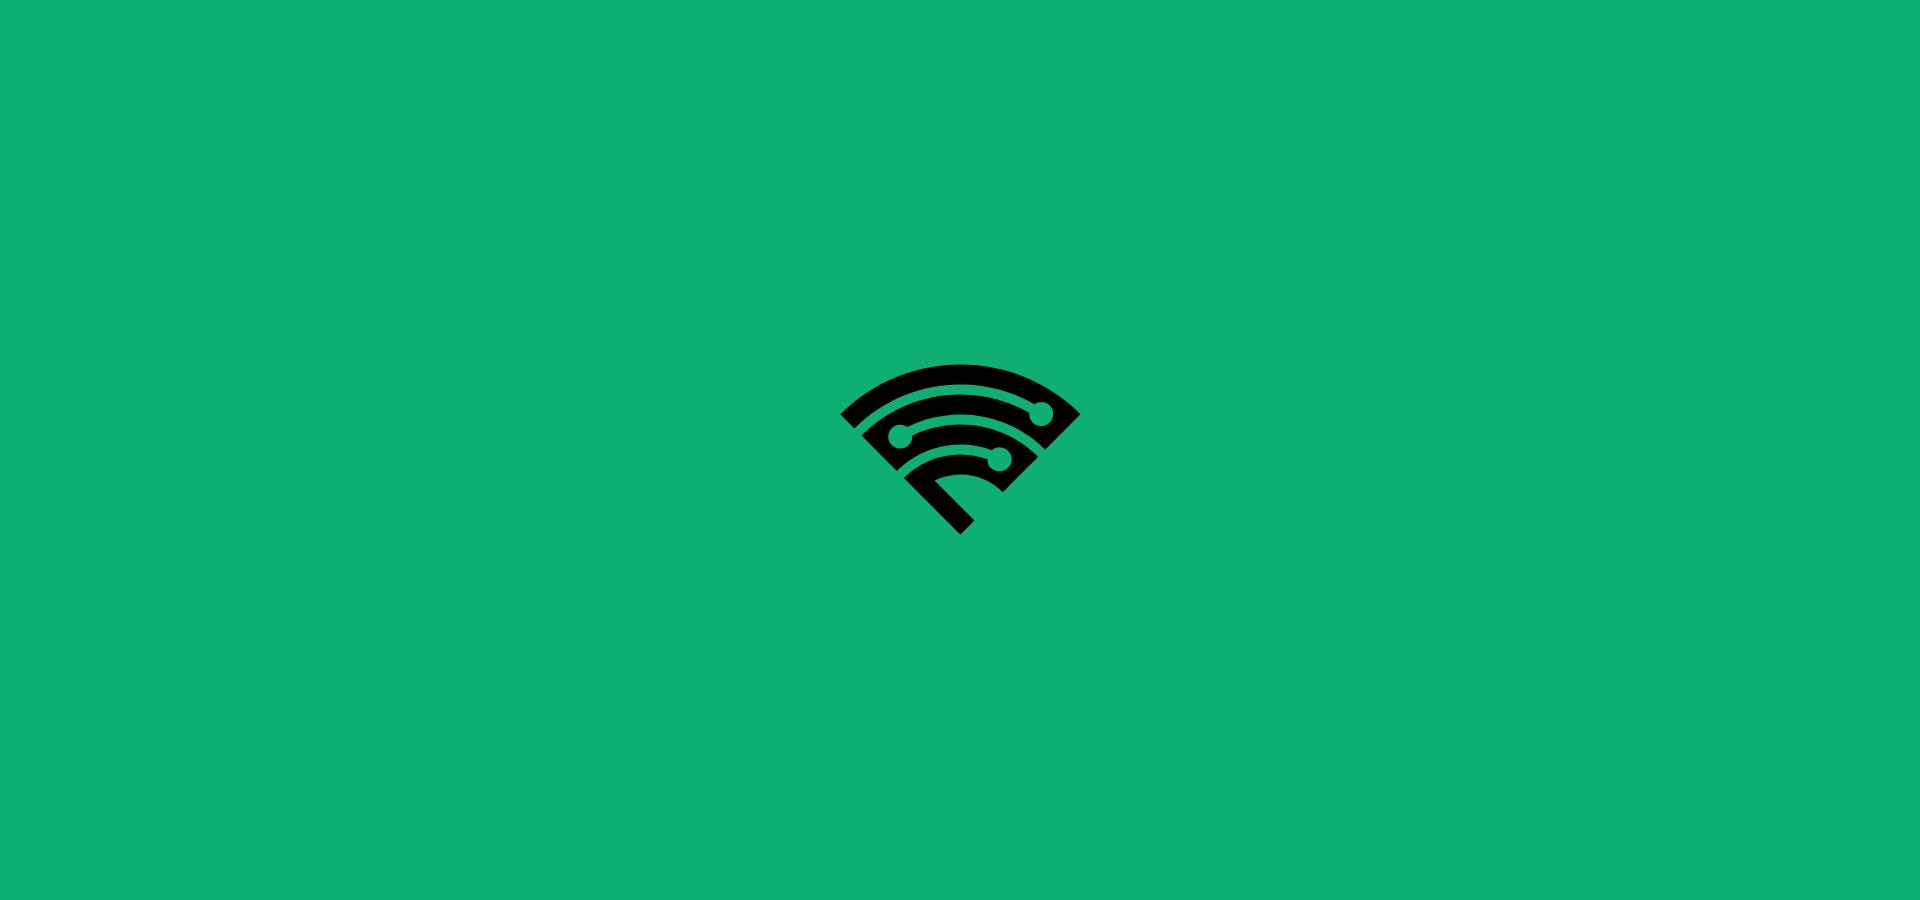 Dominik-Pacholczyk-Logo-Design-Collection-10